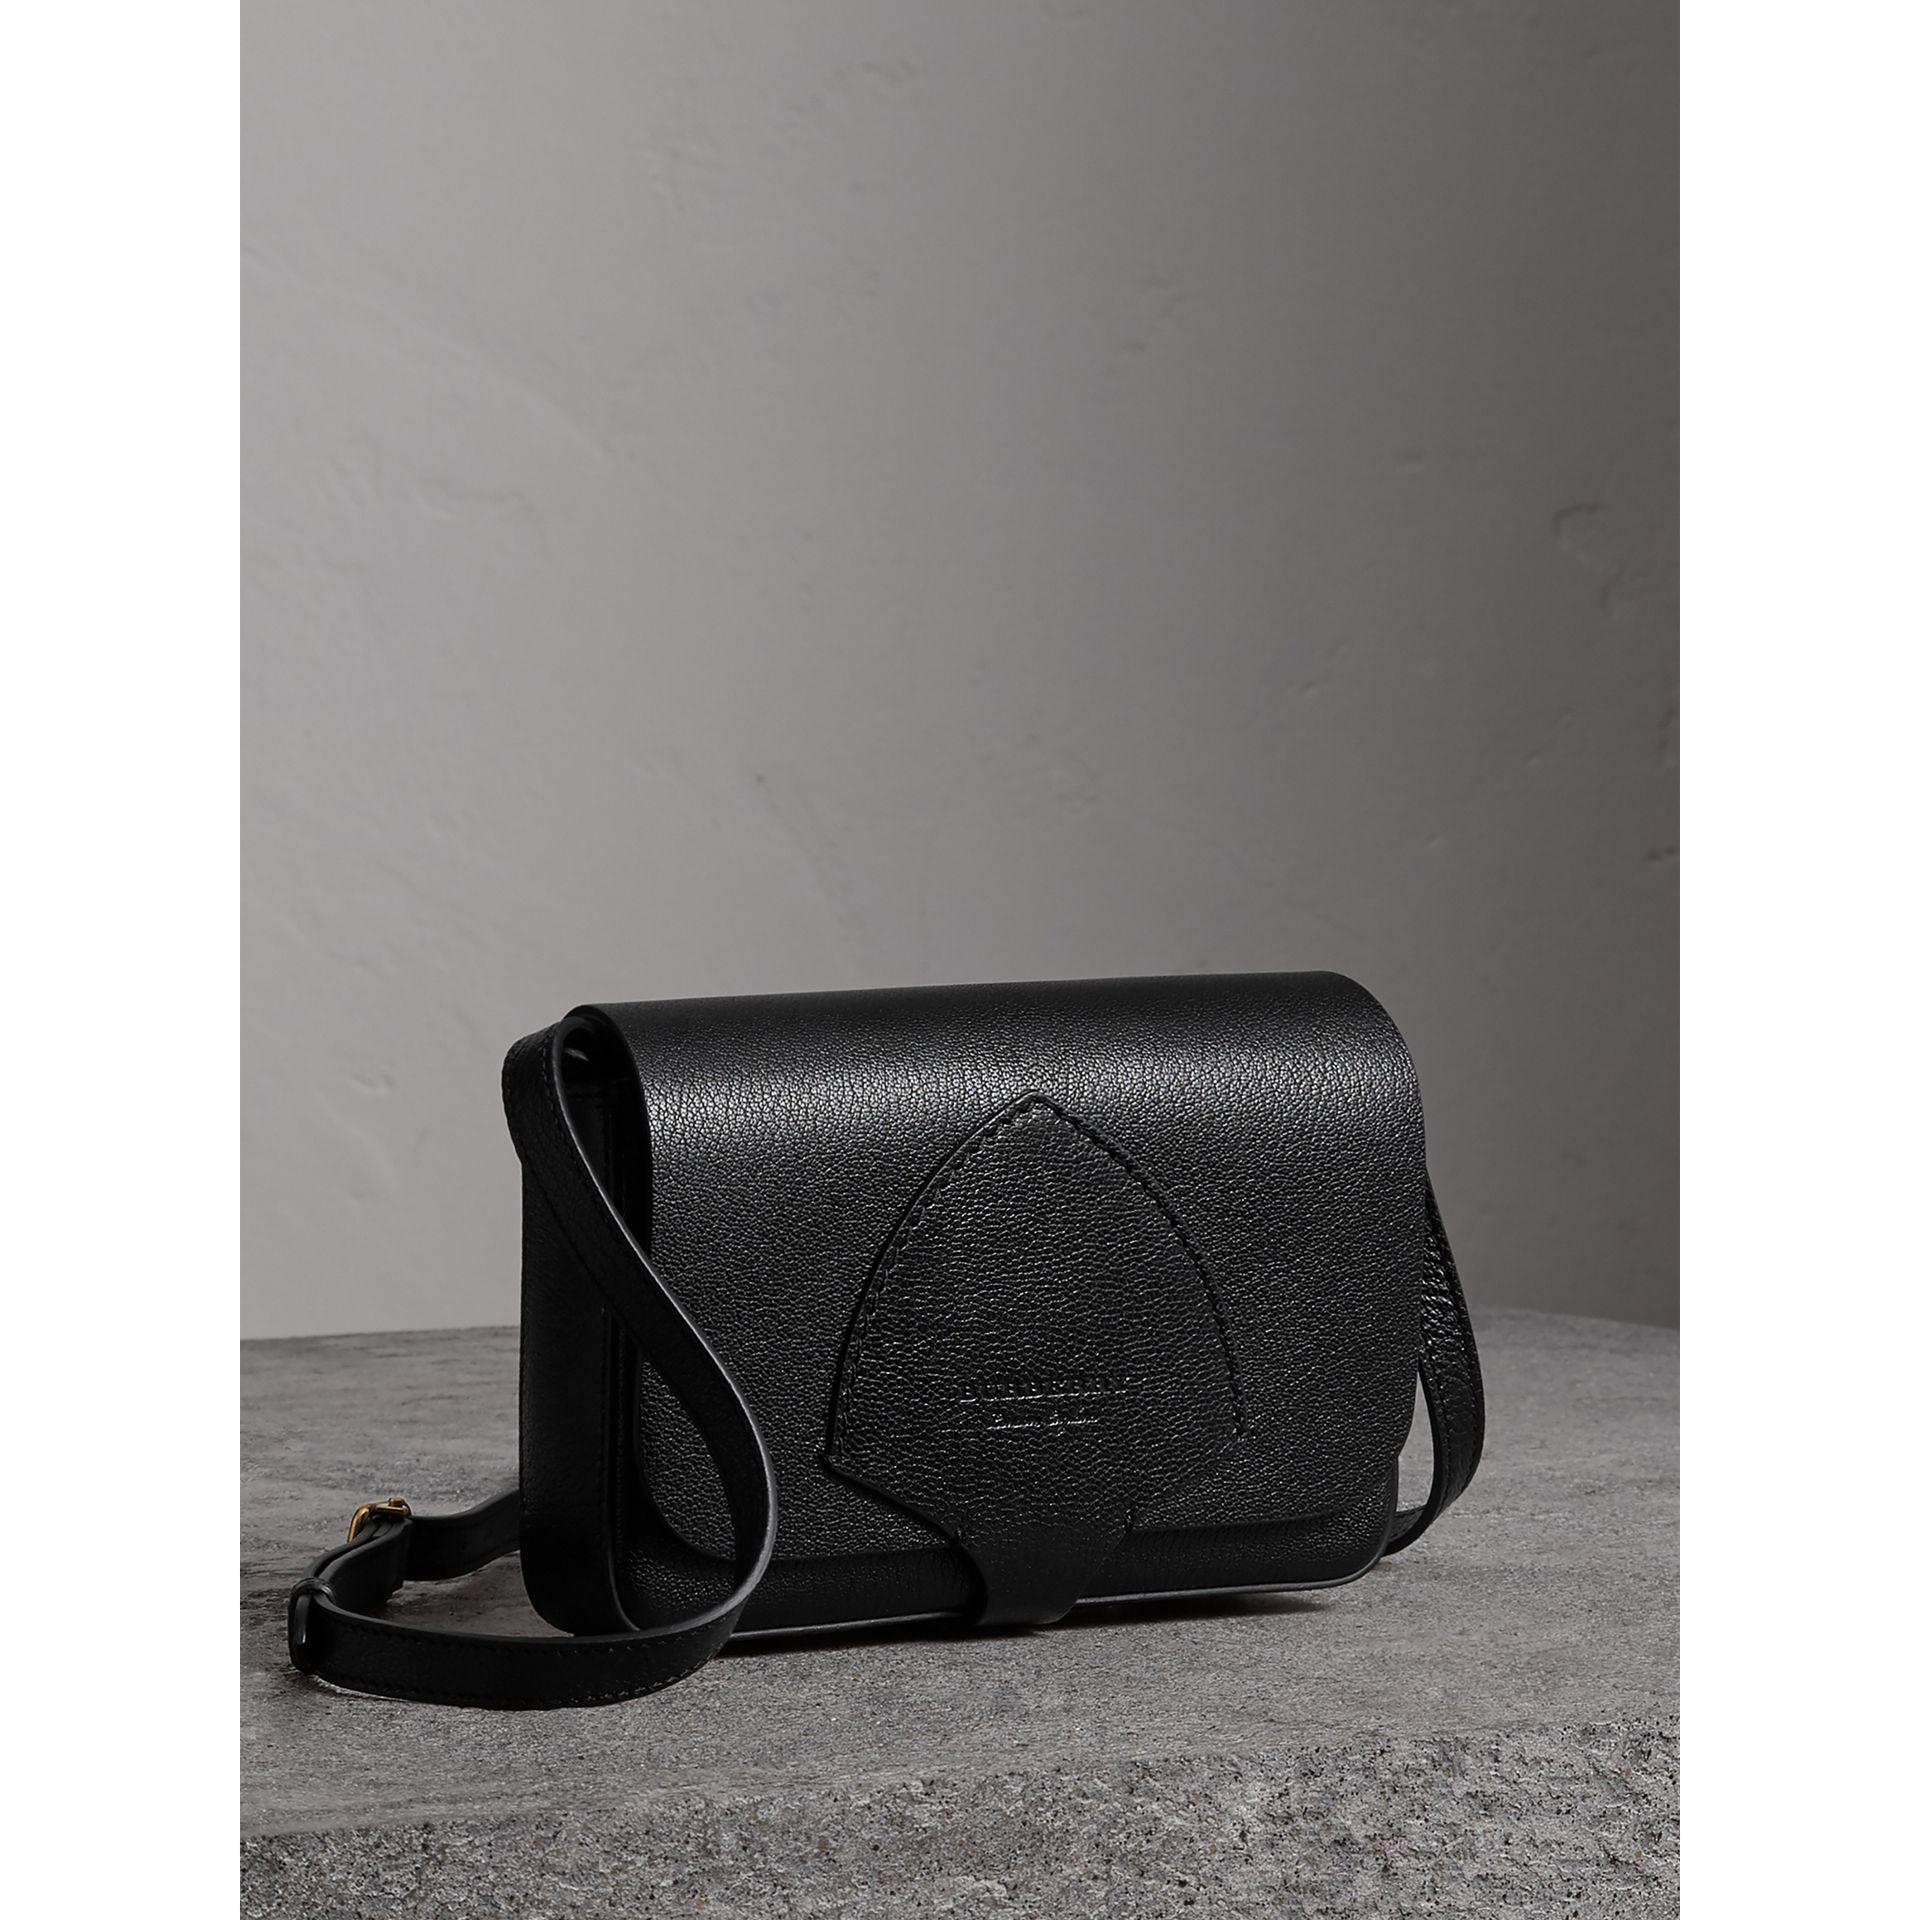 Burberry Equestrian Shield Leather Wallet with Detachable Strap Release Dates Sale Online Q1Mvlojl